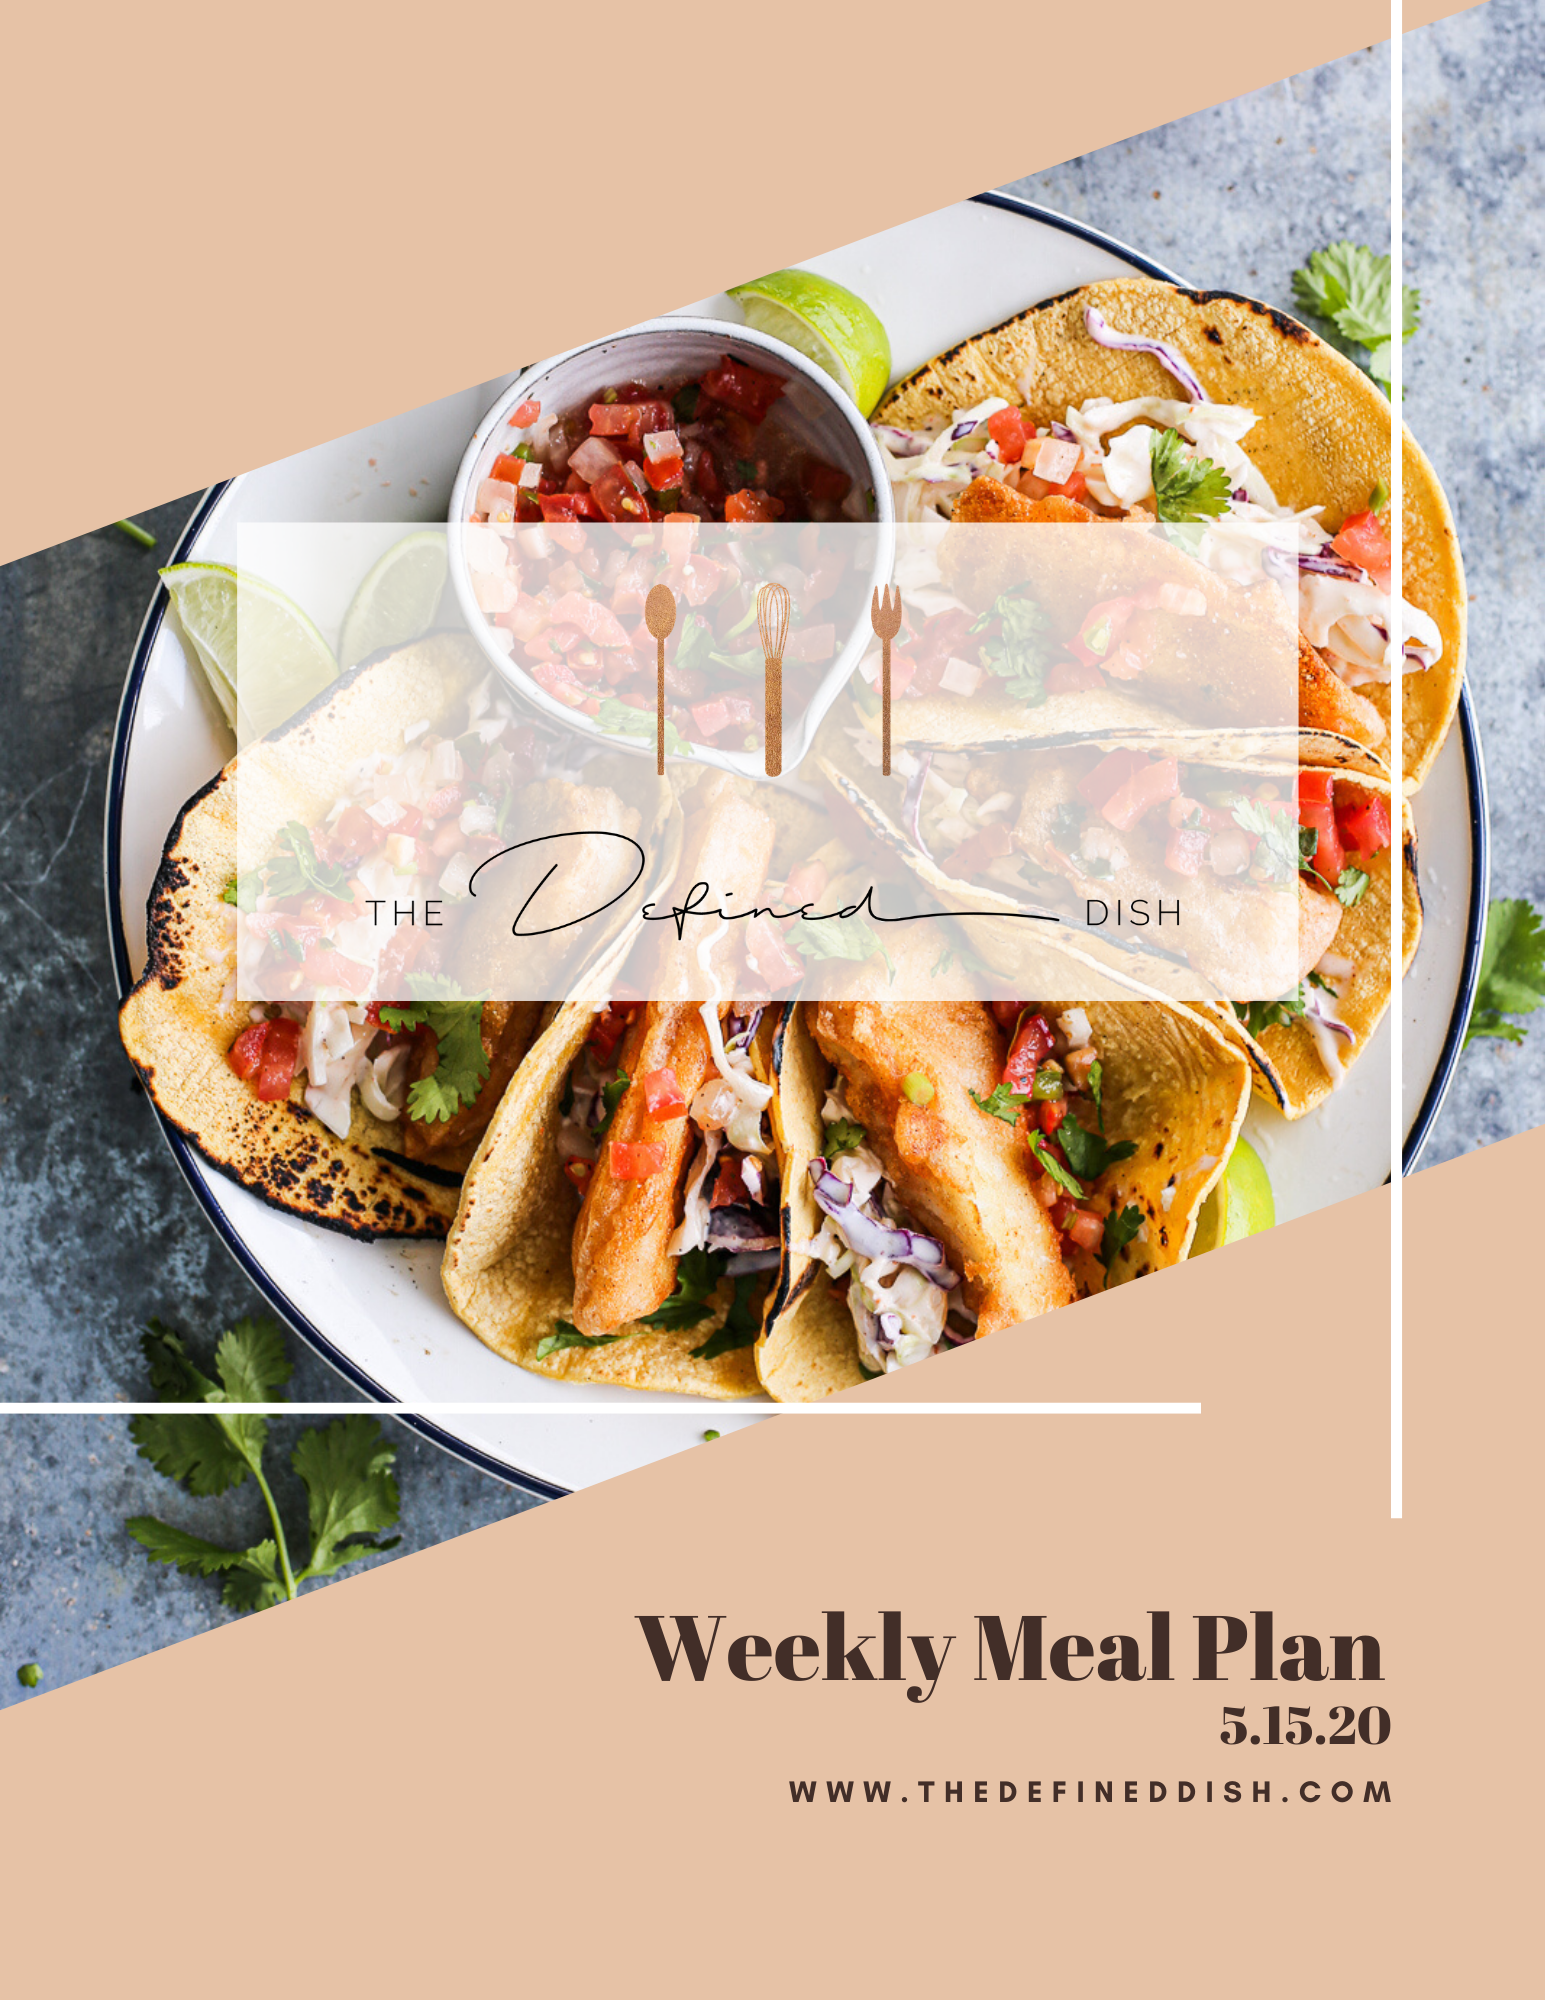 Weekly Meal Plan 5.15.20